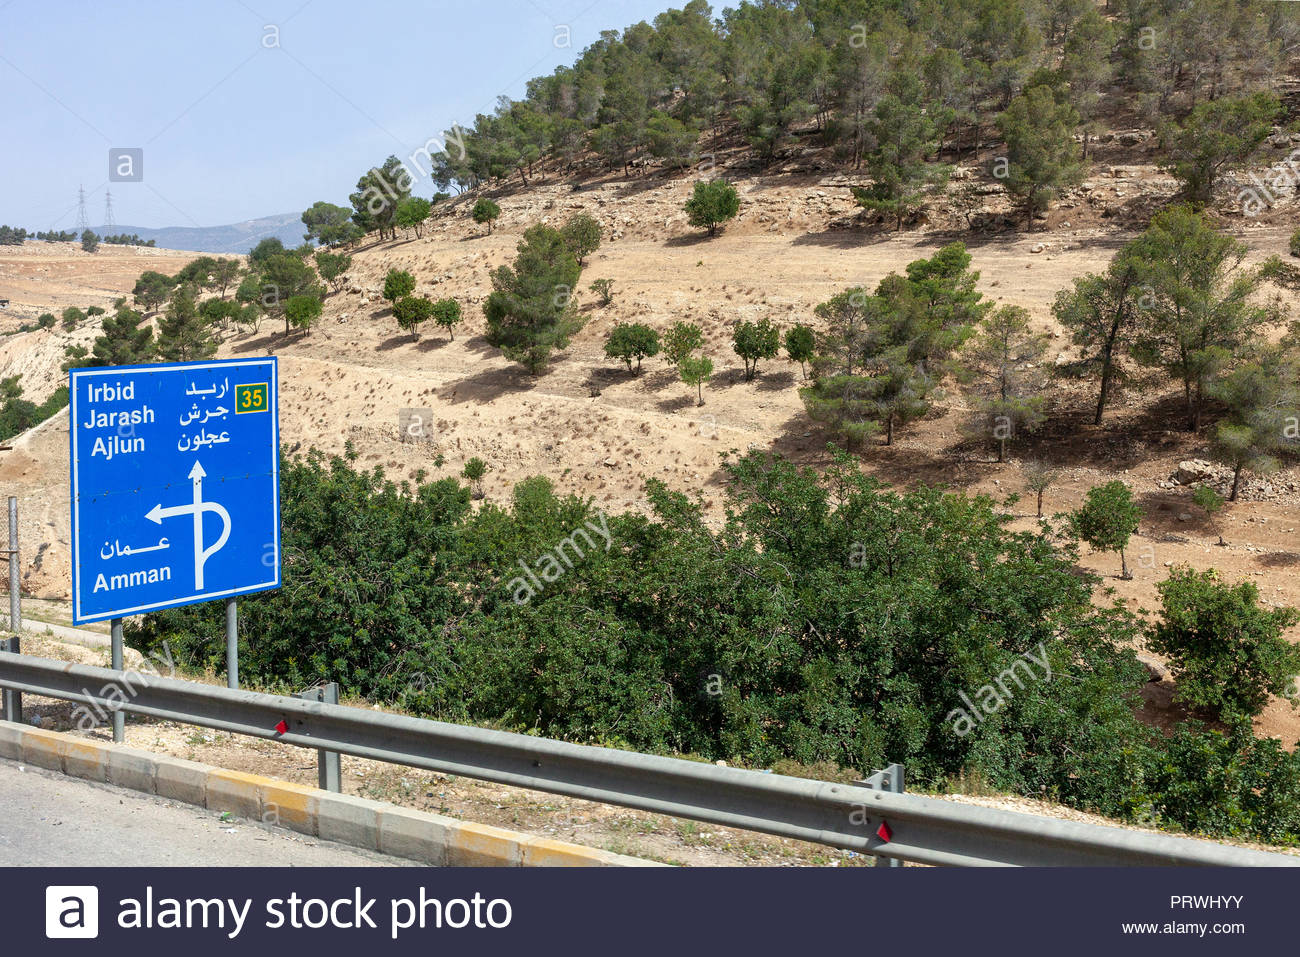 Highway Road Sign in Jordan - Amman, Irbid, Jarash, and Ajlun - Stock Image